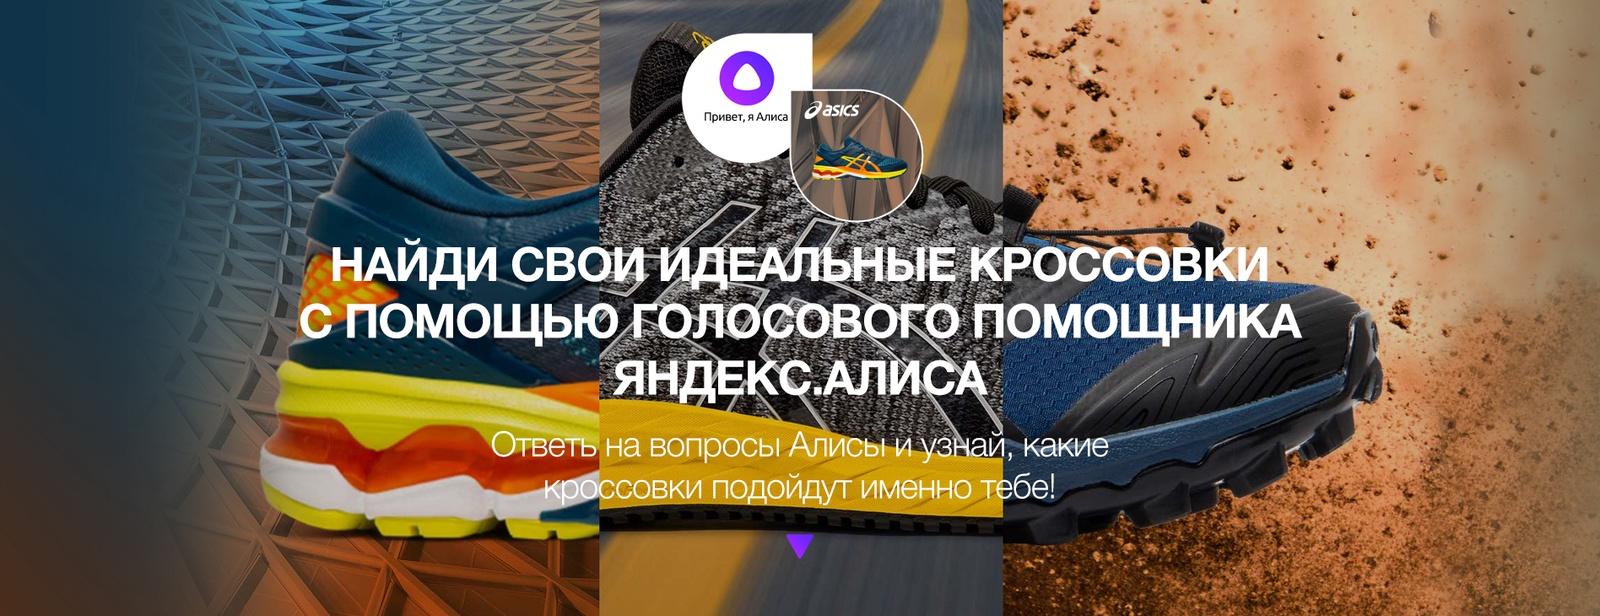 adidas gazelle st Petersburg gtx gortex city series Depop